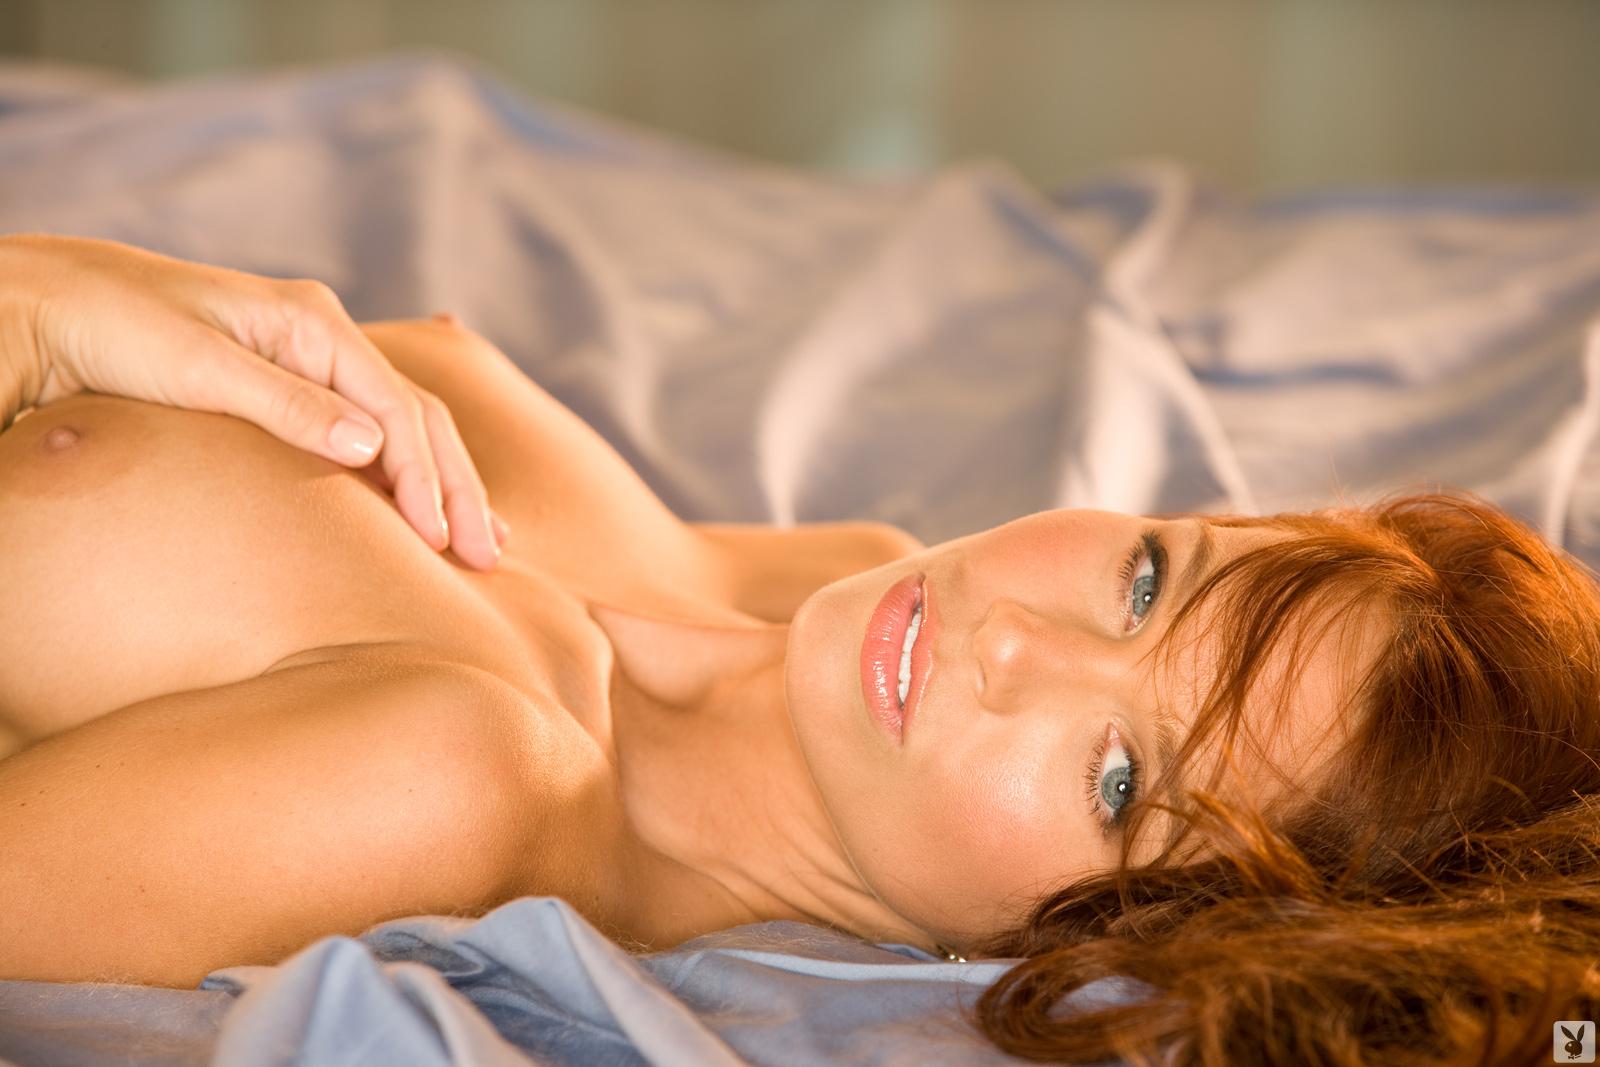 Aj alexander naked pictures